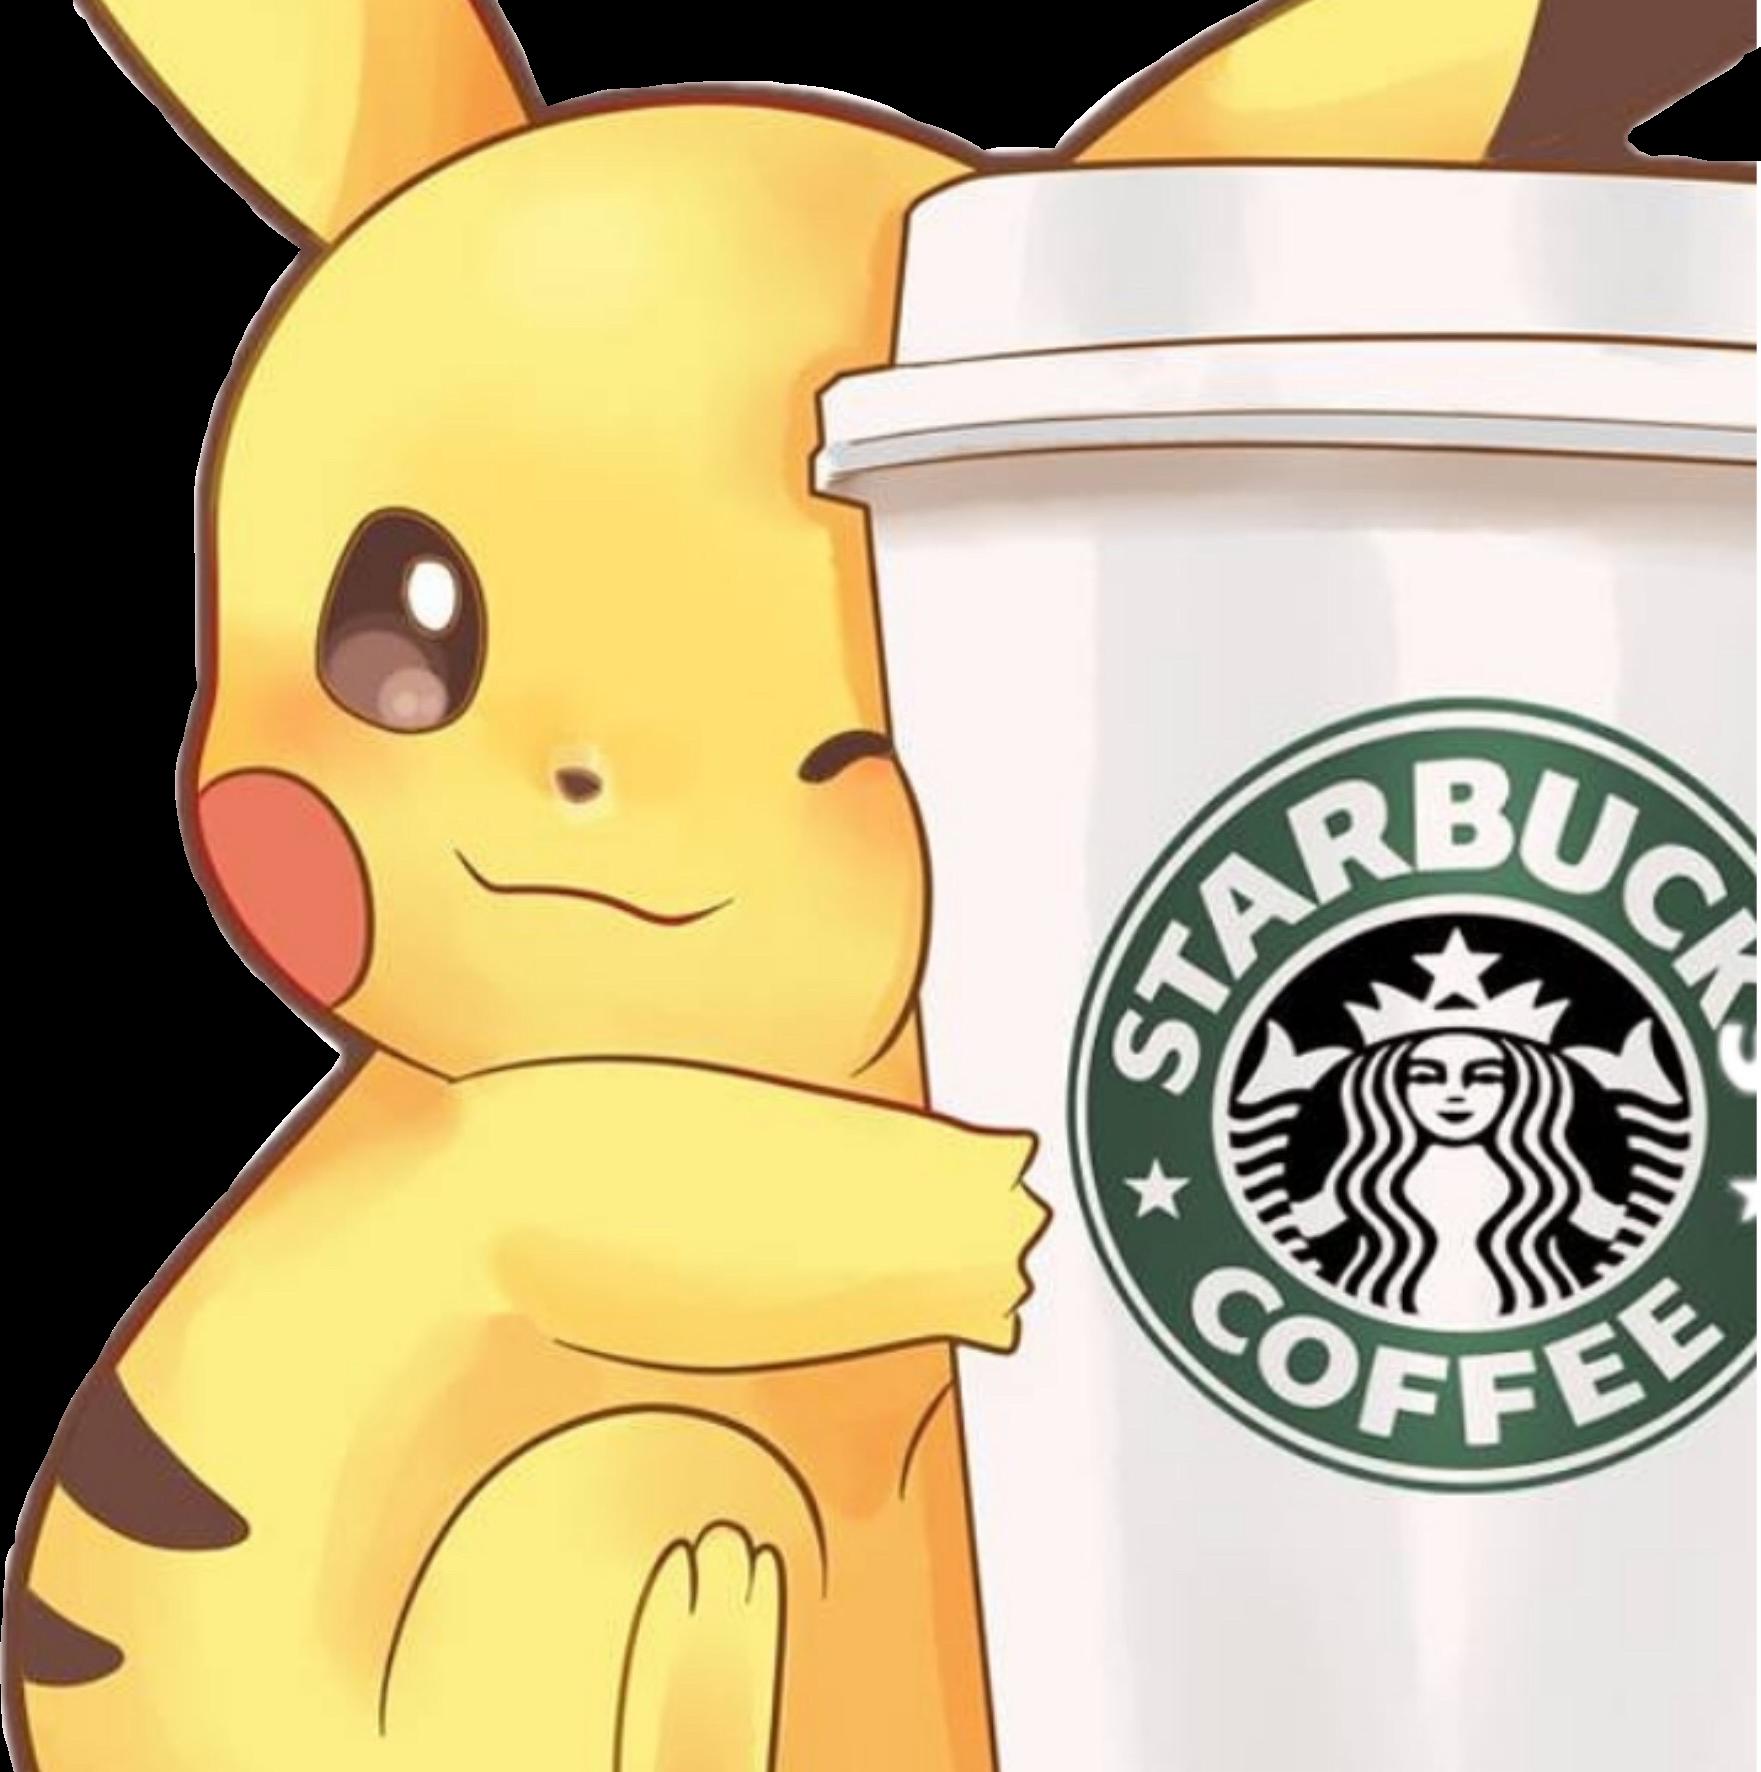 Pickachu Kawaii Starbucks Cute Pokemonsticker Wow Awwwwwww Pikachu Pokemon Stickers Pokemon Pictures